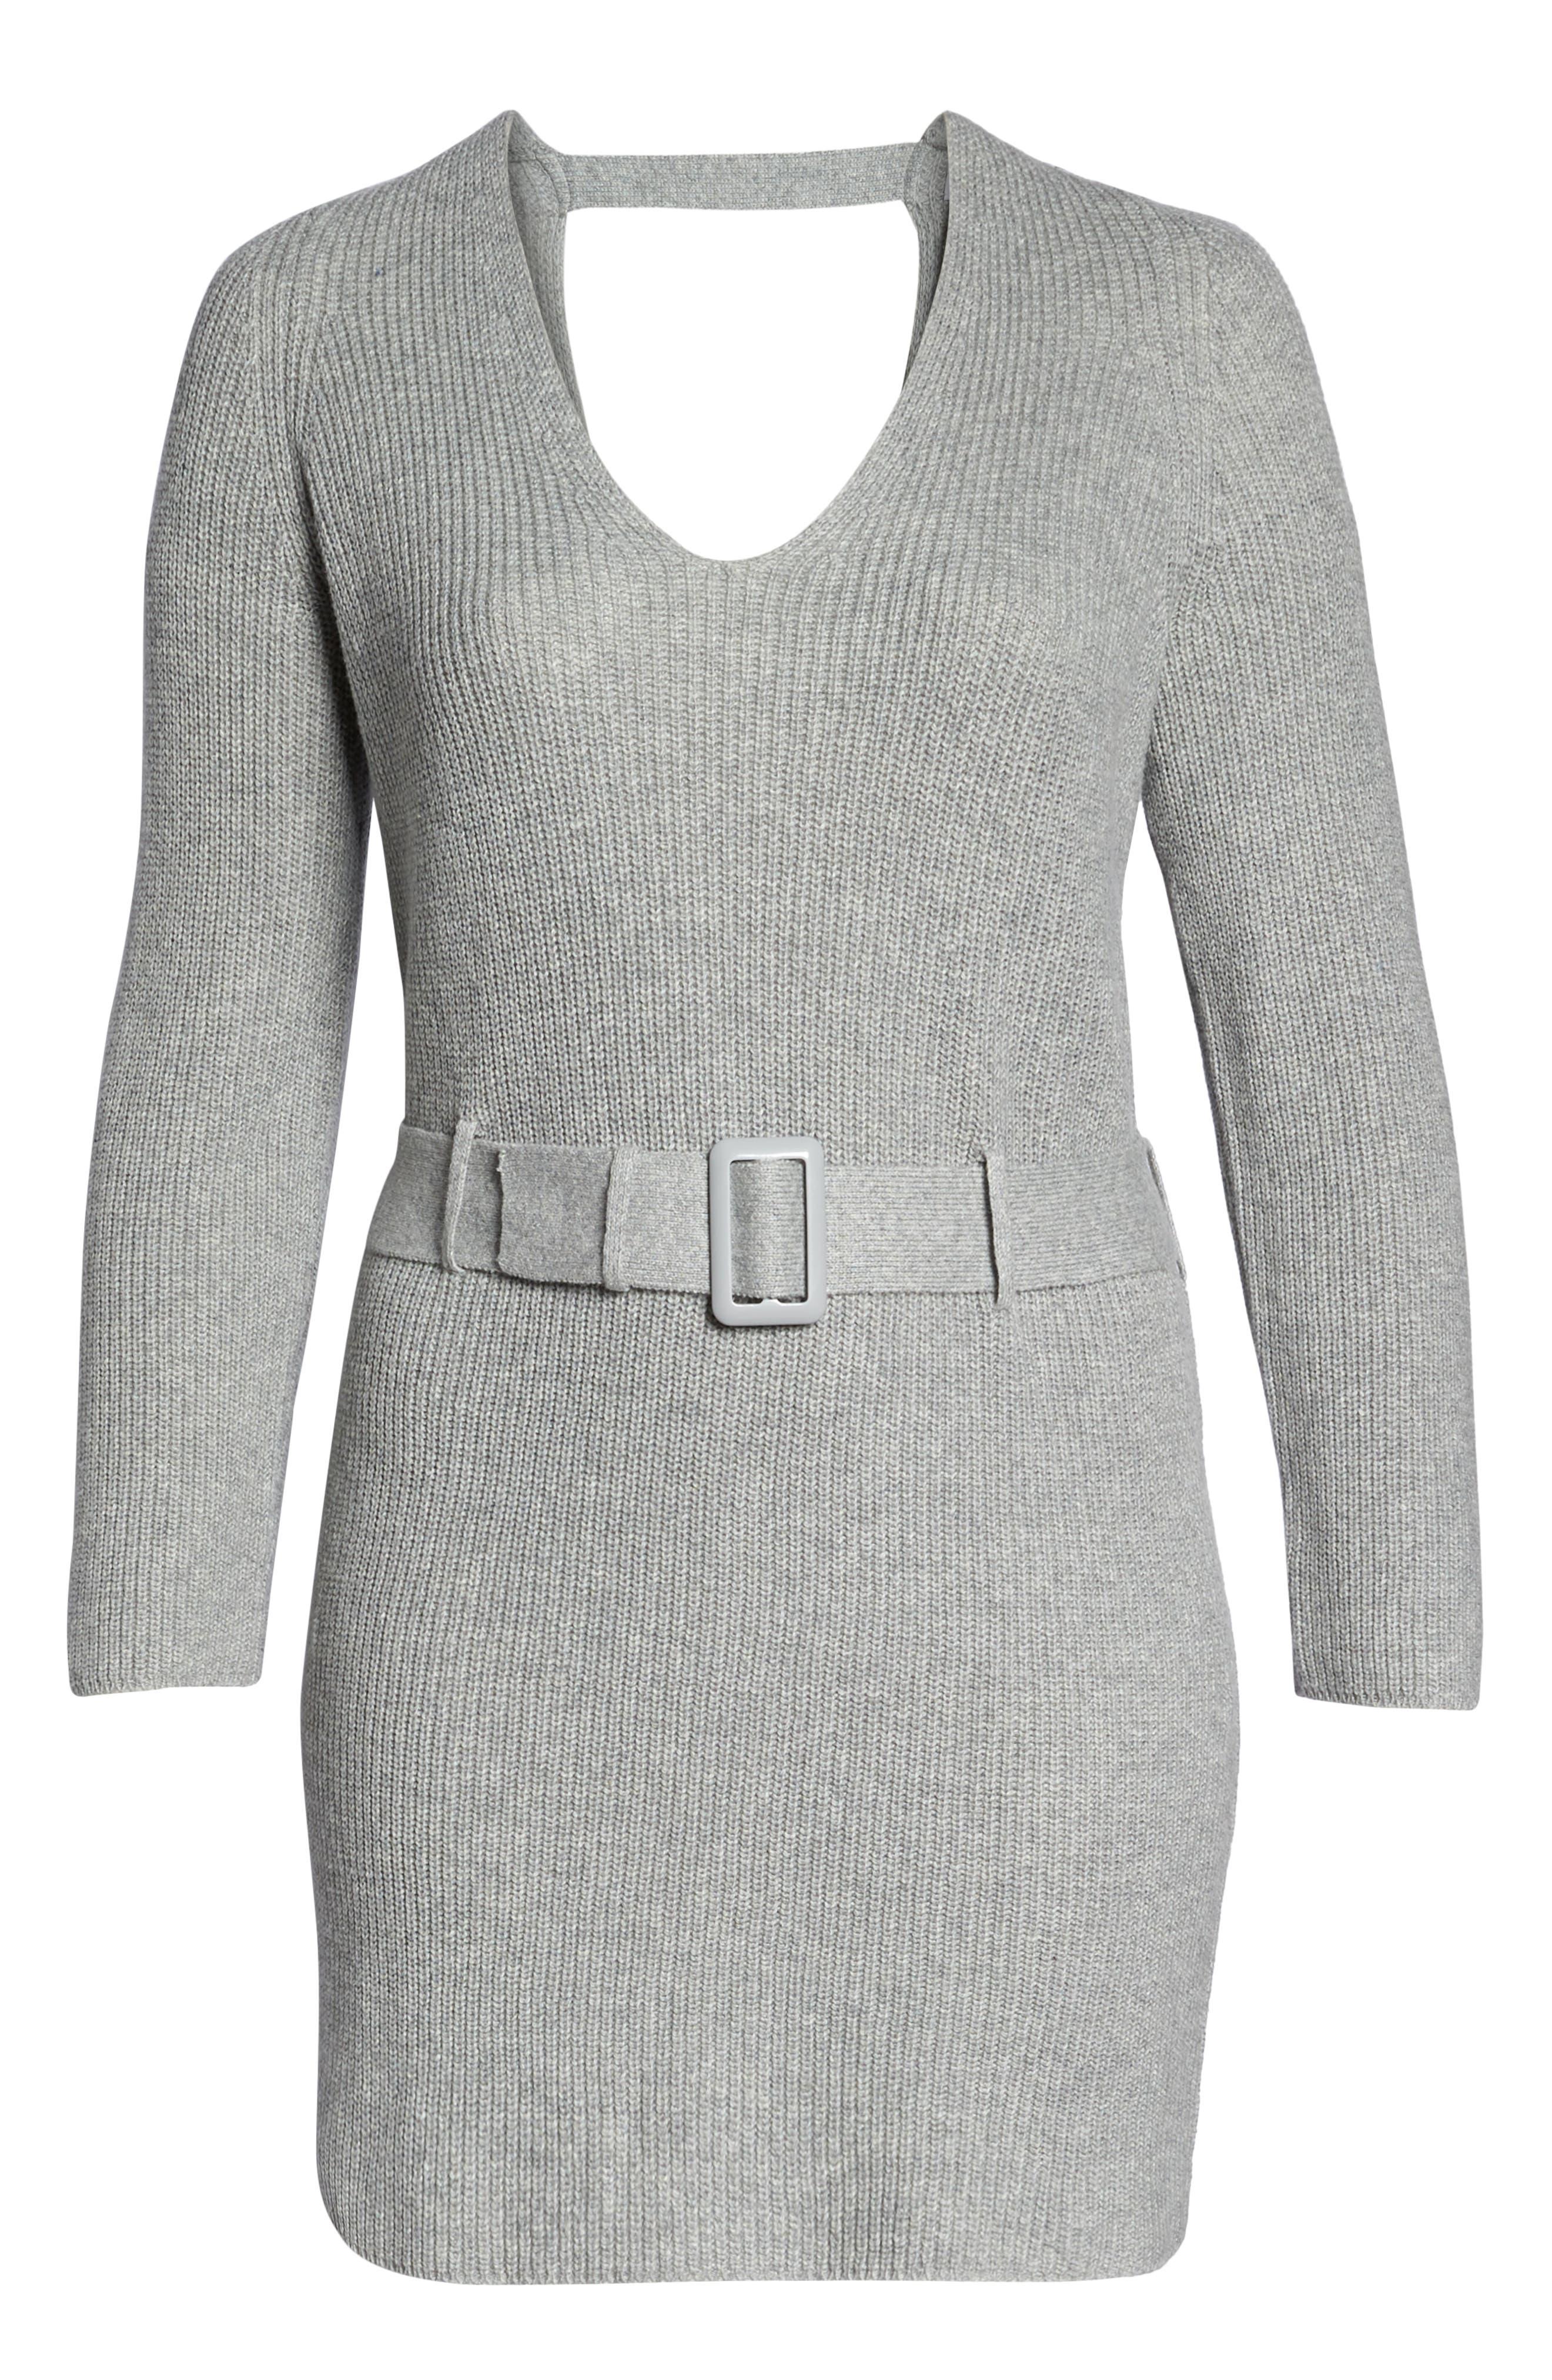 Belted Sweater Dress,                             Alternate thumbnail 7, color,                             GREY MEDIUM HEATHER